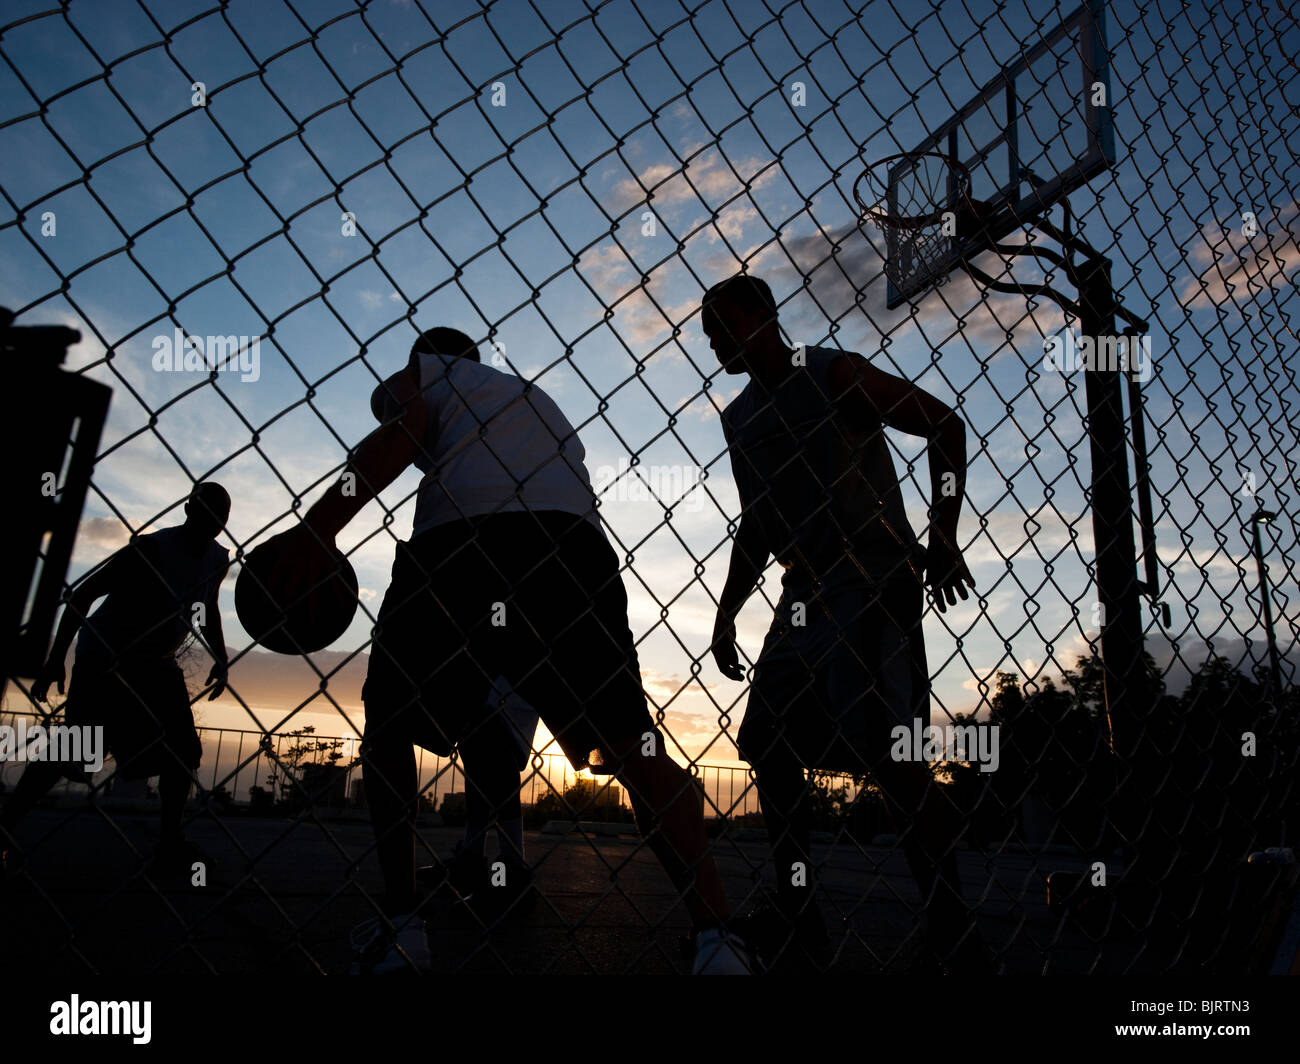 USA, Utah, Salt Lake City, vier junge Männer spielen street-Basketball, niedrigen Winkel Ansicht Stockbild